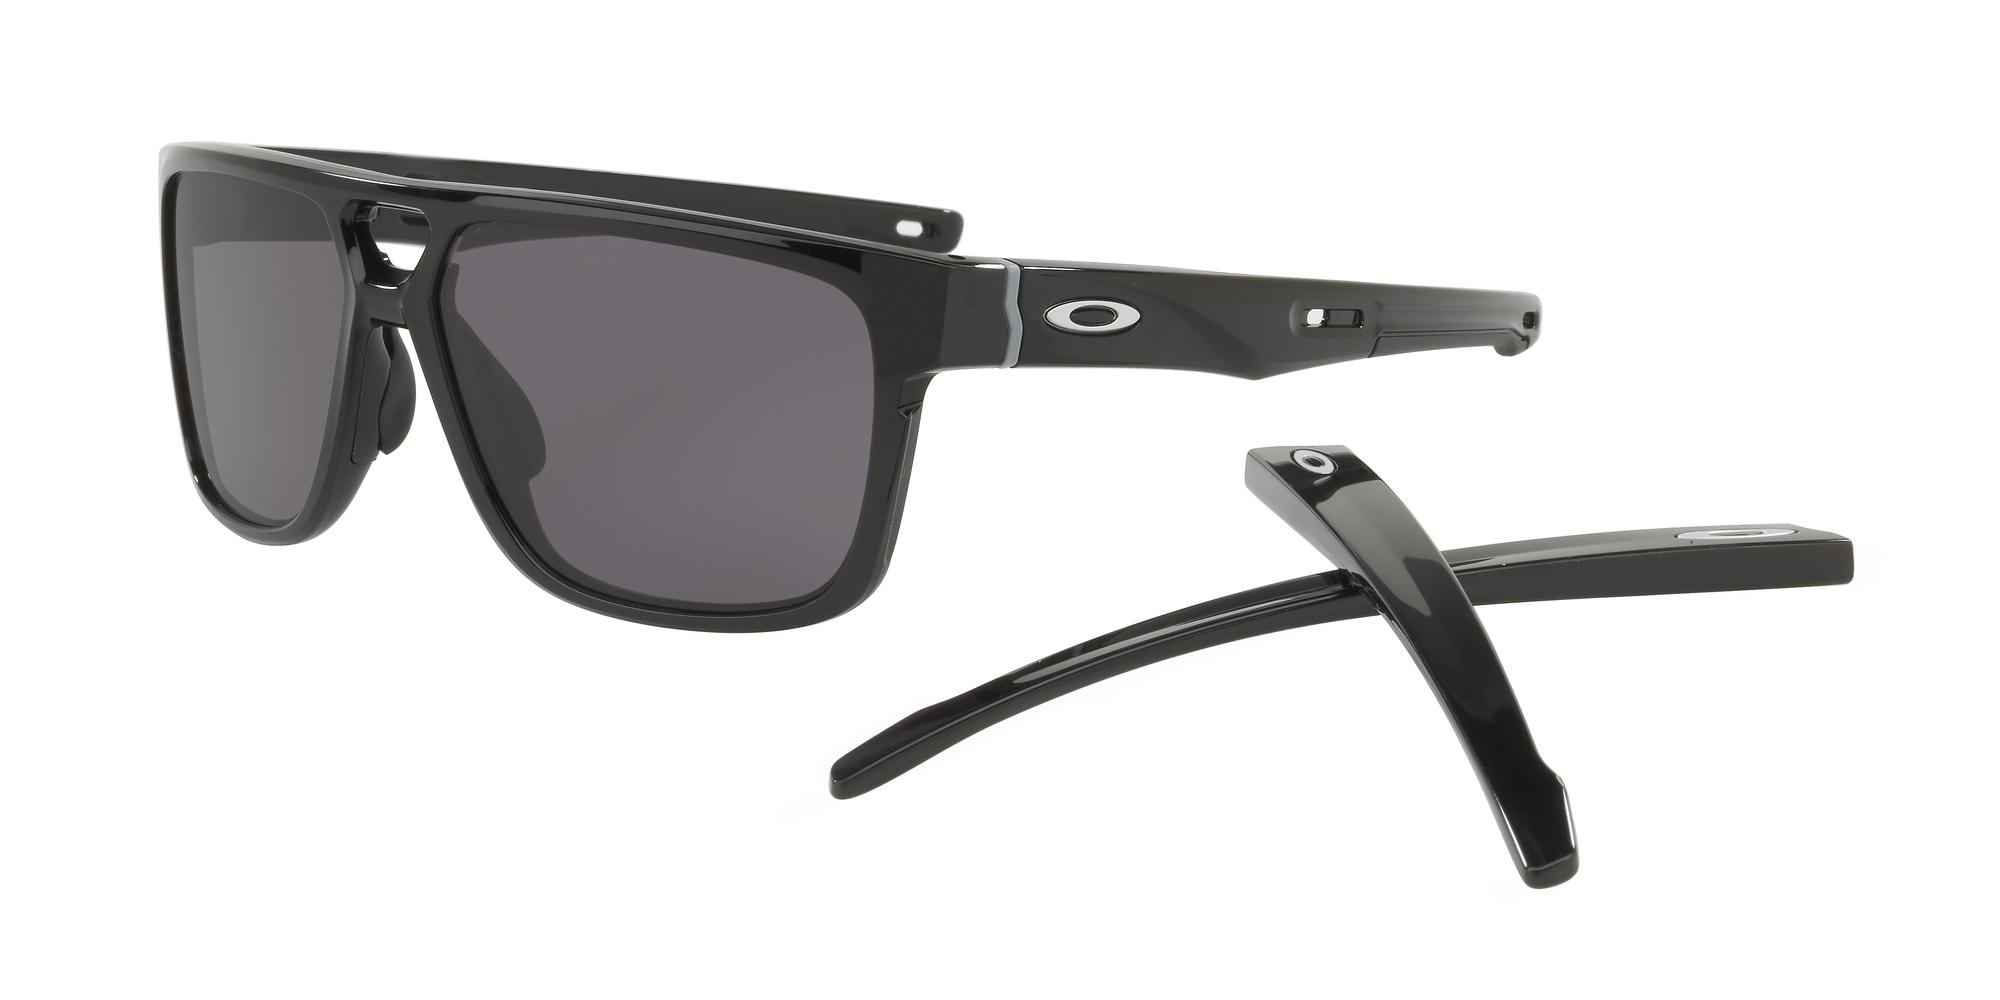 007c811eaf6 Oakley CROSSRANGE PATCH OO9382 Sunglasses